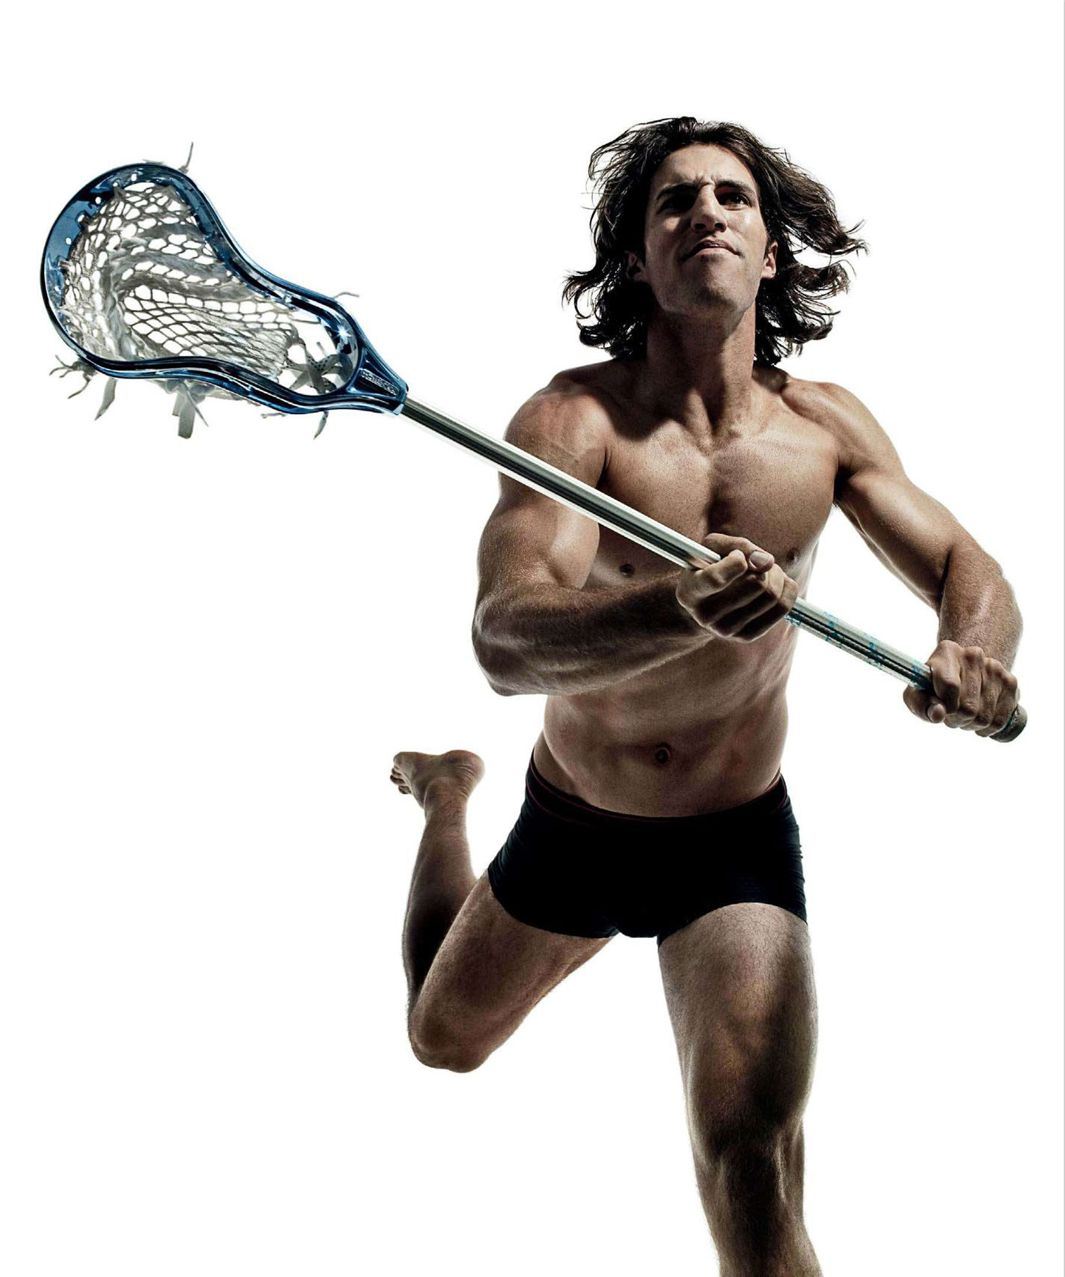 Пол Рабил / Paul Rabil - ESPN Magazine Body Issue 18 october 2010